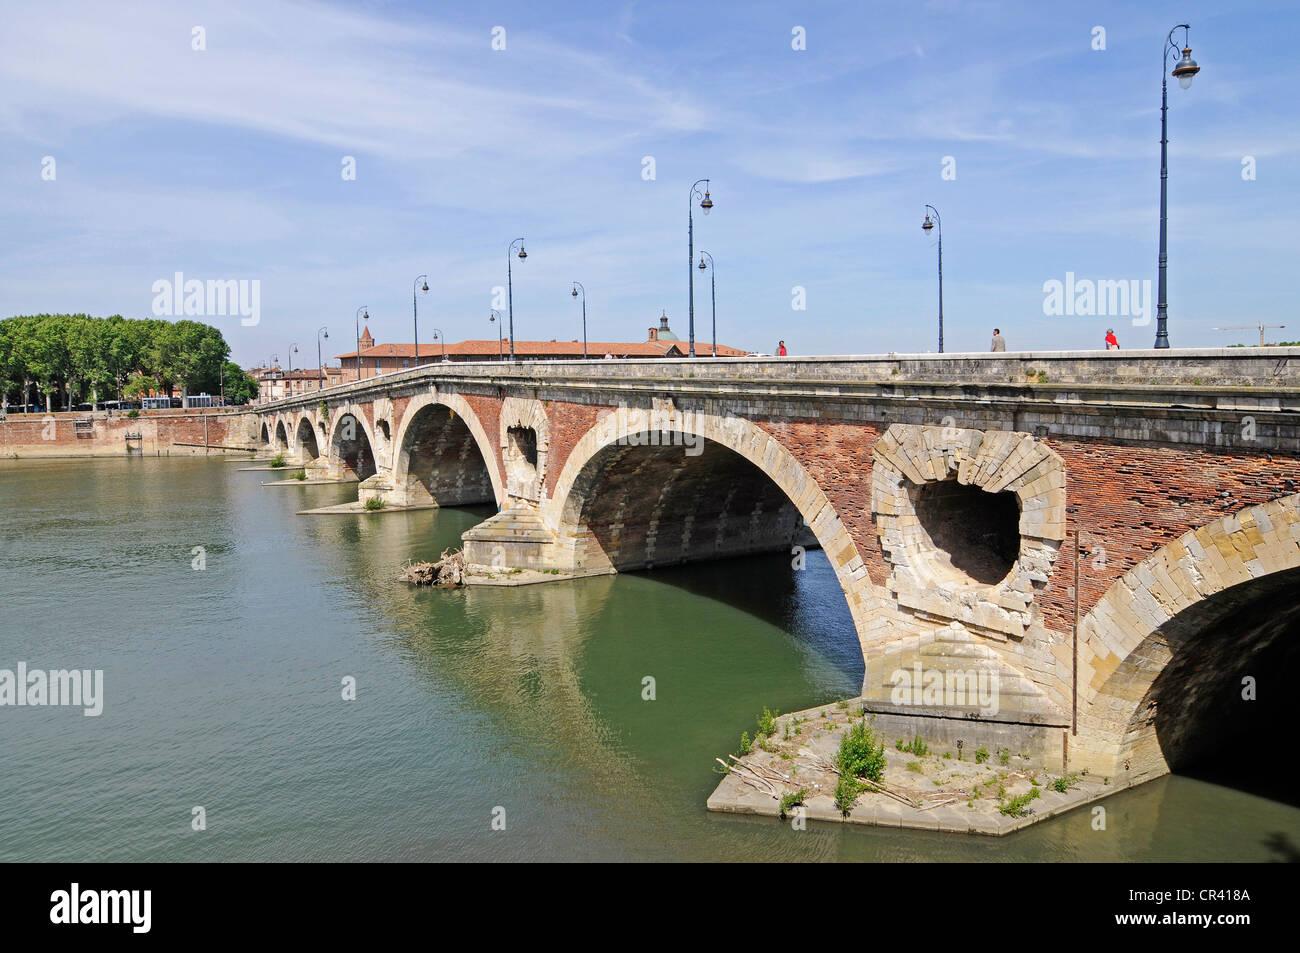 Pont Neuf bridge, river Garonne, Toulouse, Departement Haute-Garonne, Midi-Pyrenees, France, Europe - Stock Image